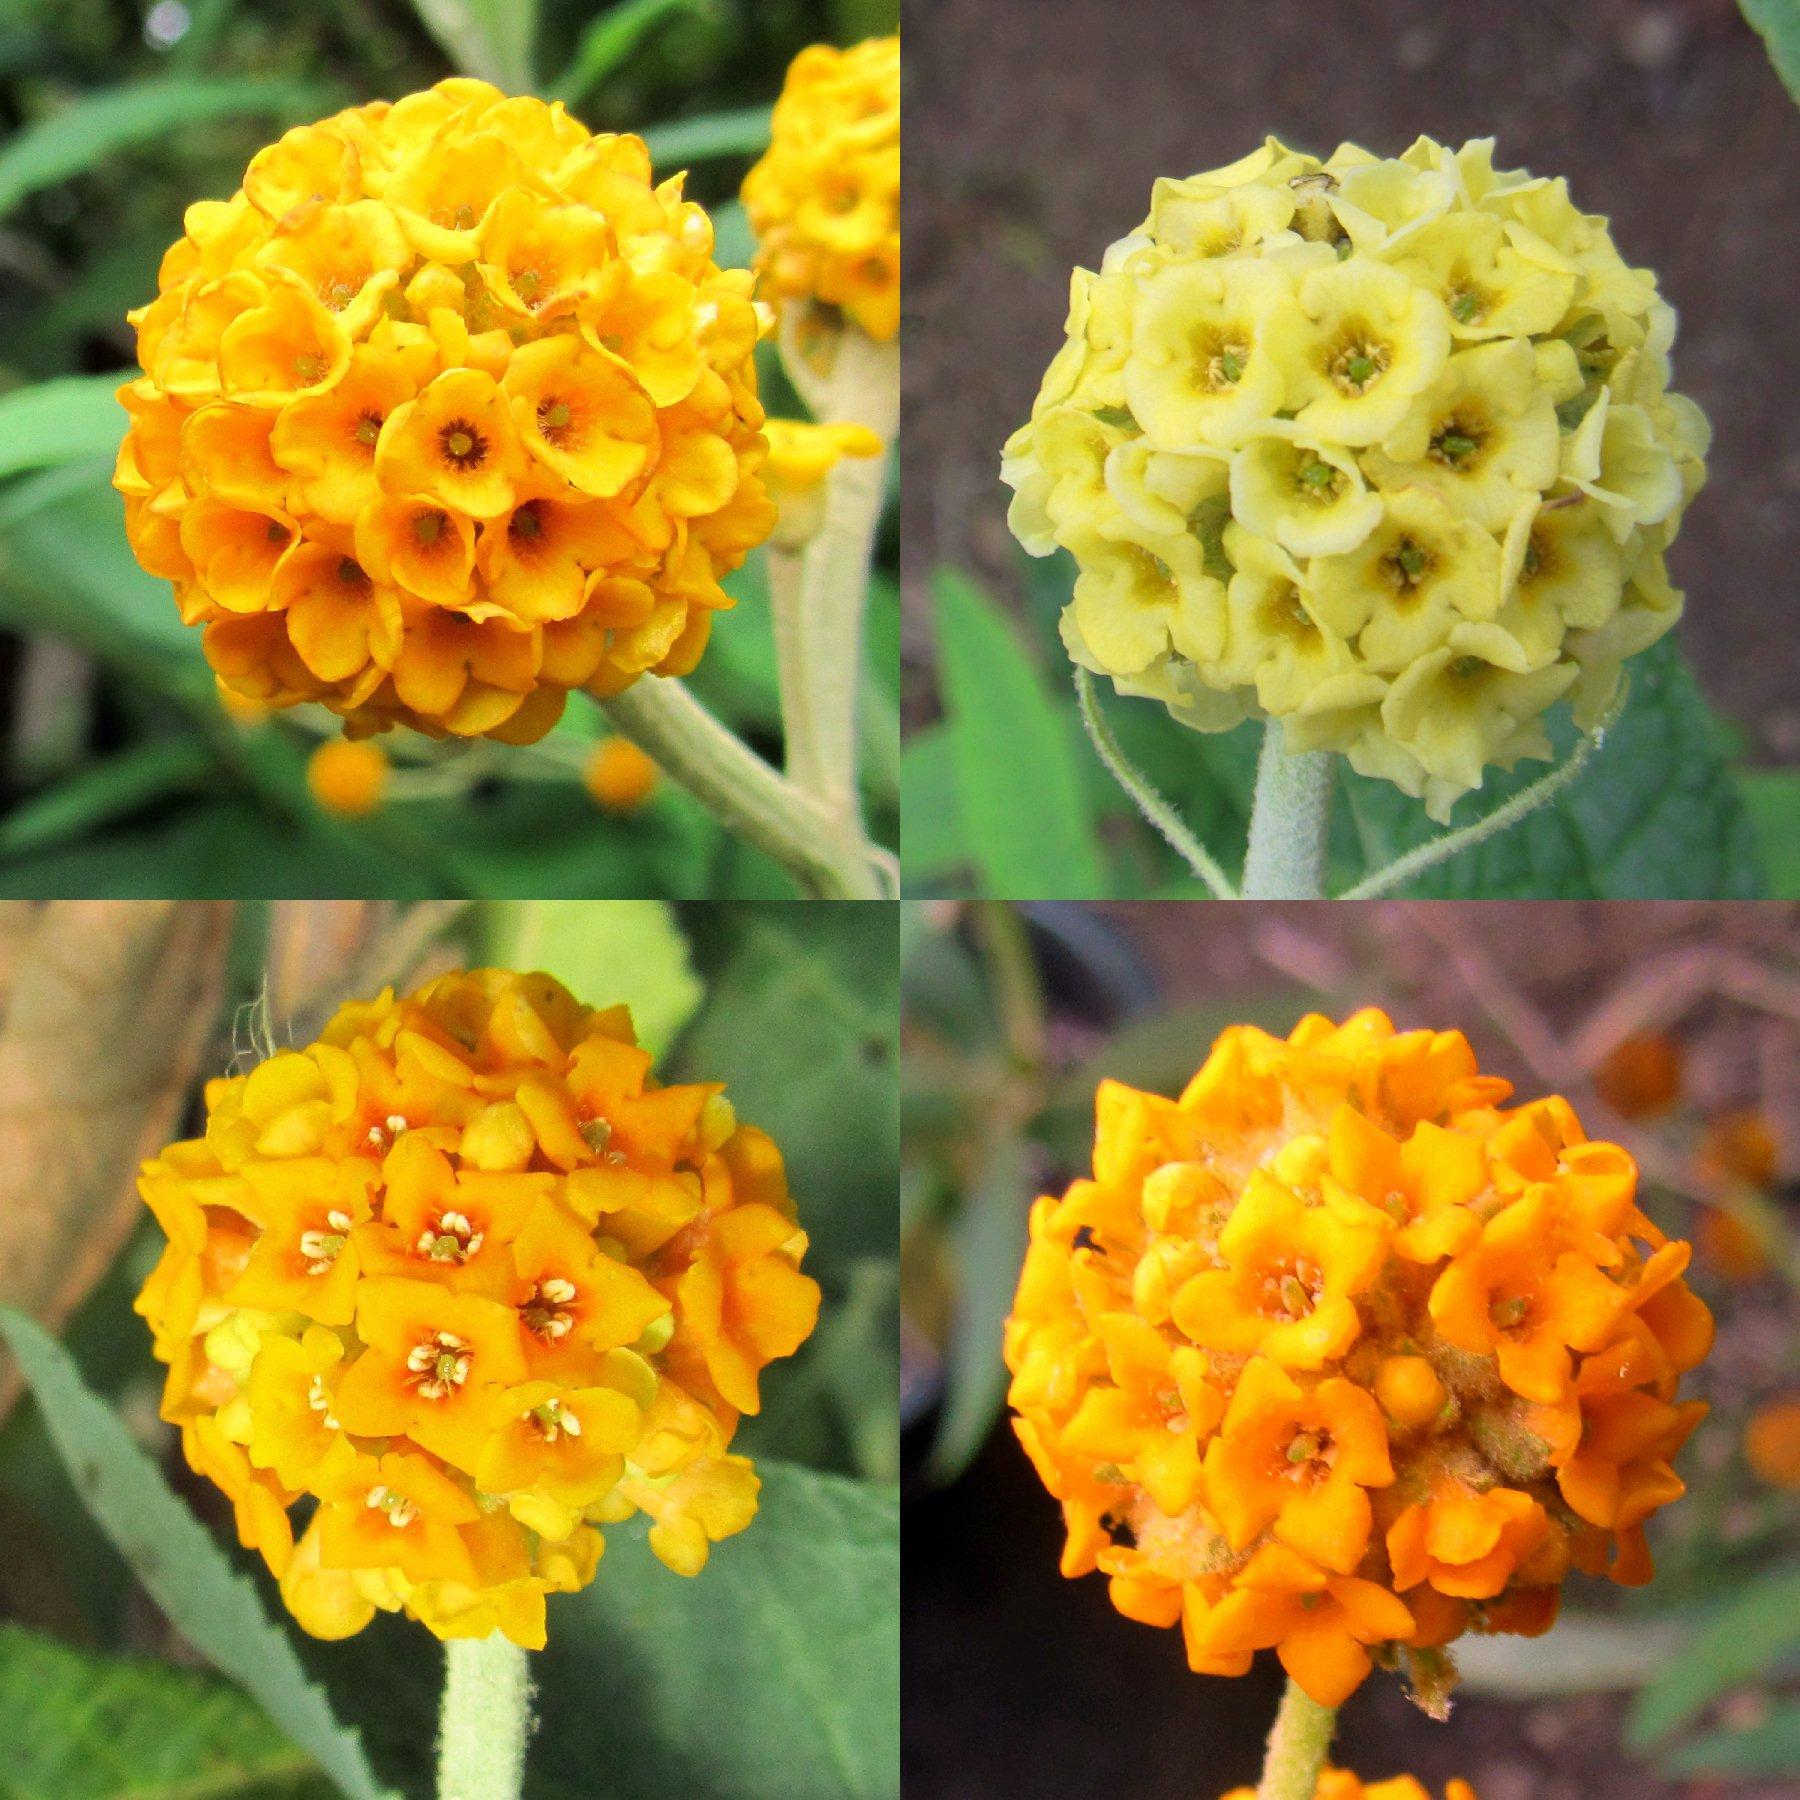 The Buddleja Garden Buddleia Globosa And Araucana Nappii